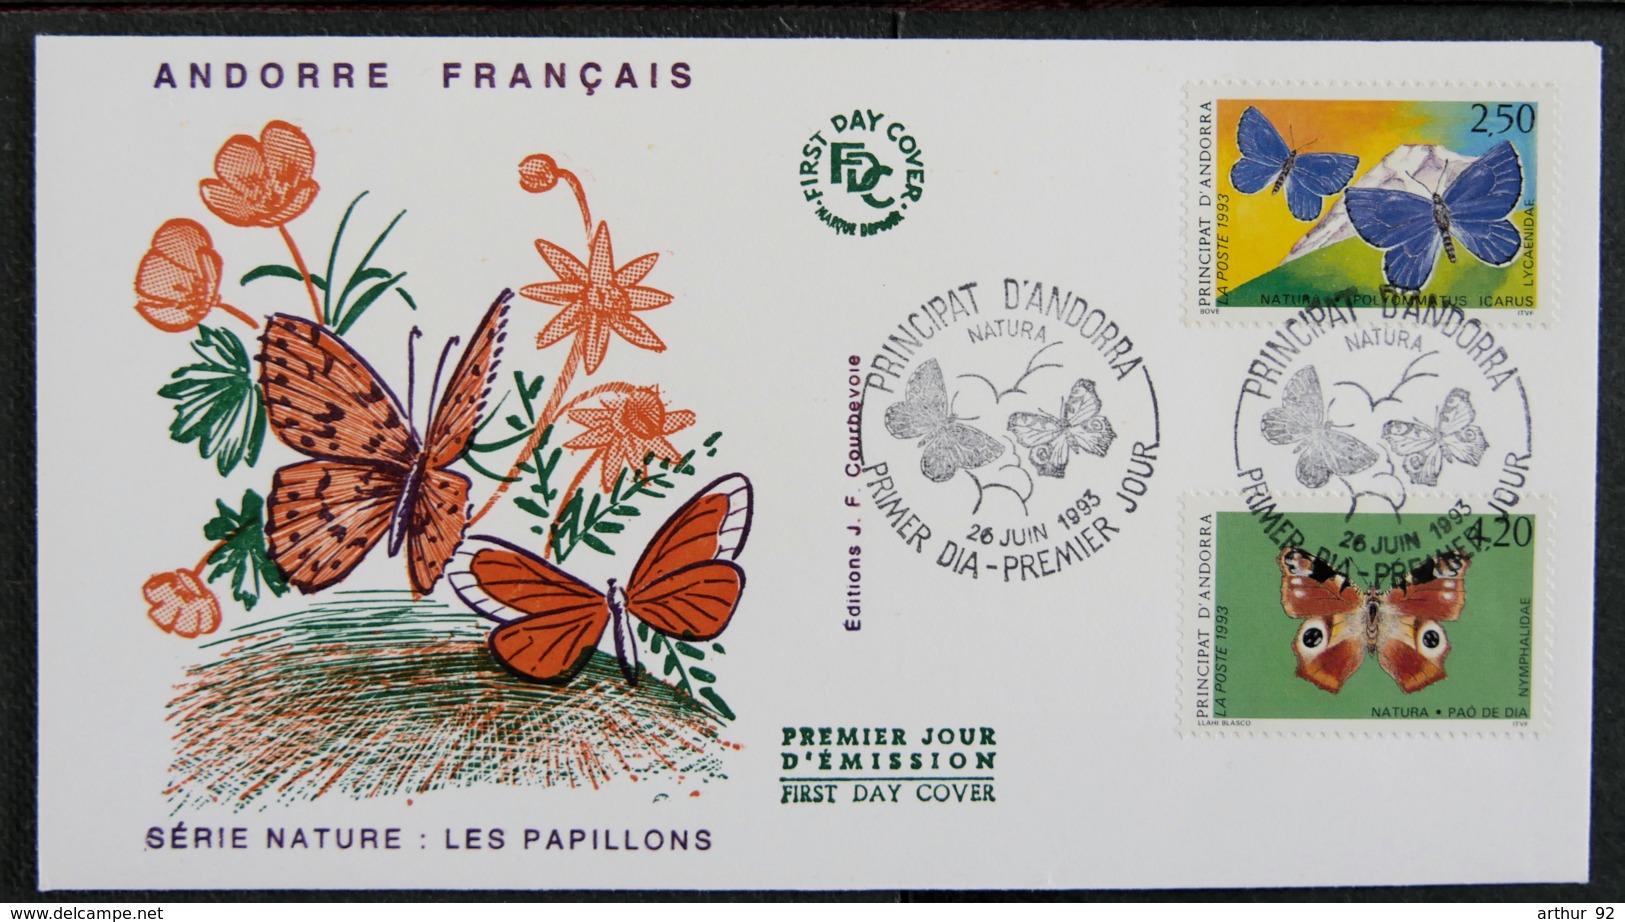 ANDORRE FRANCAIS - 1993 - FDC NATURA - LES PAPILLONS - French Andorra